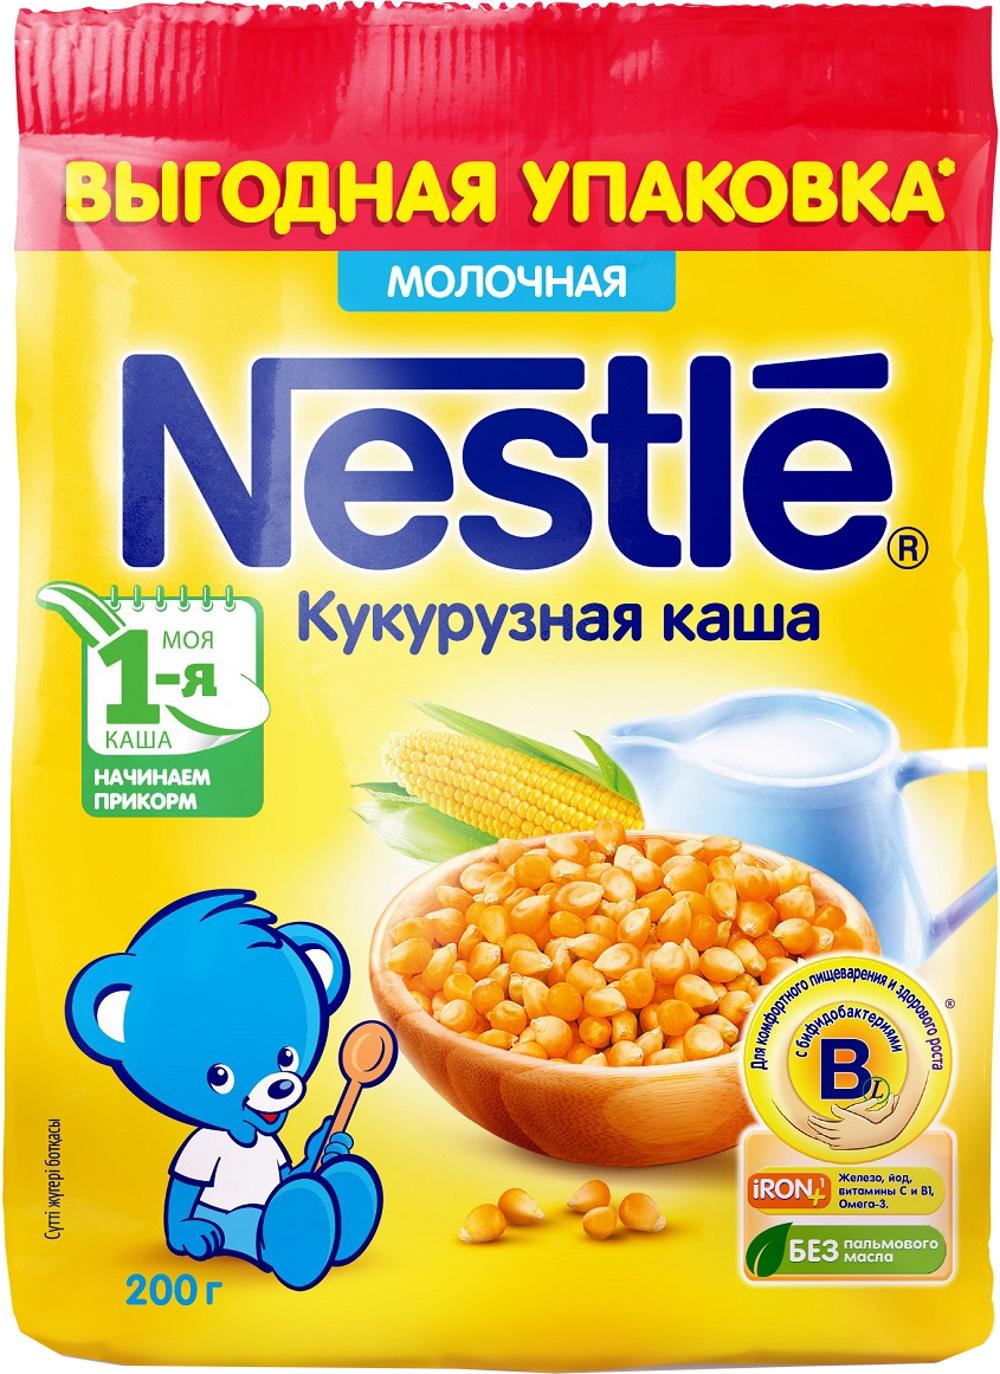 Детские каши Nestle Nestlé Молочная кукурузная (с 5 месяцев) 200 г все цены